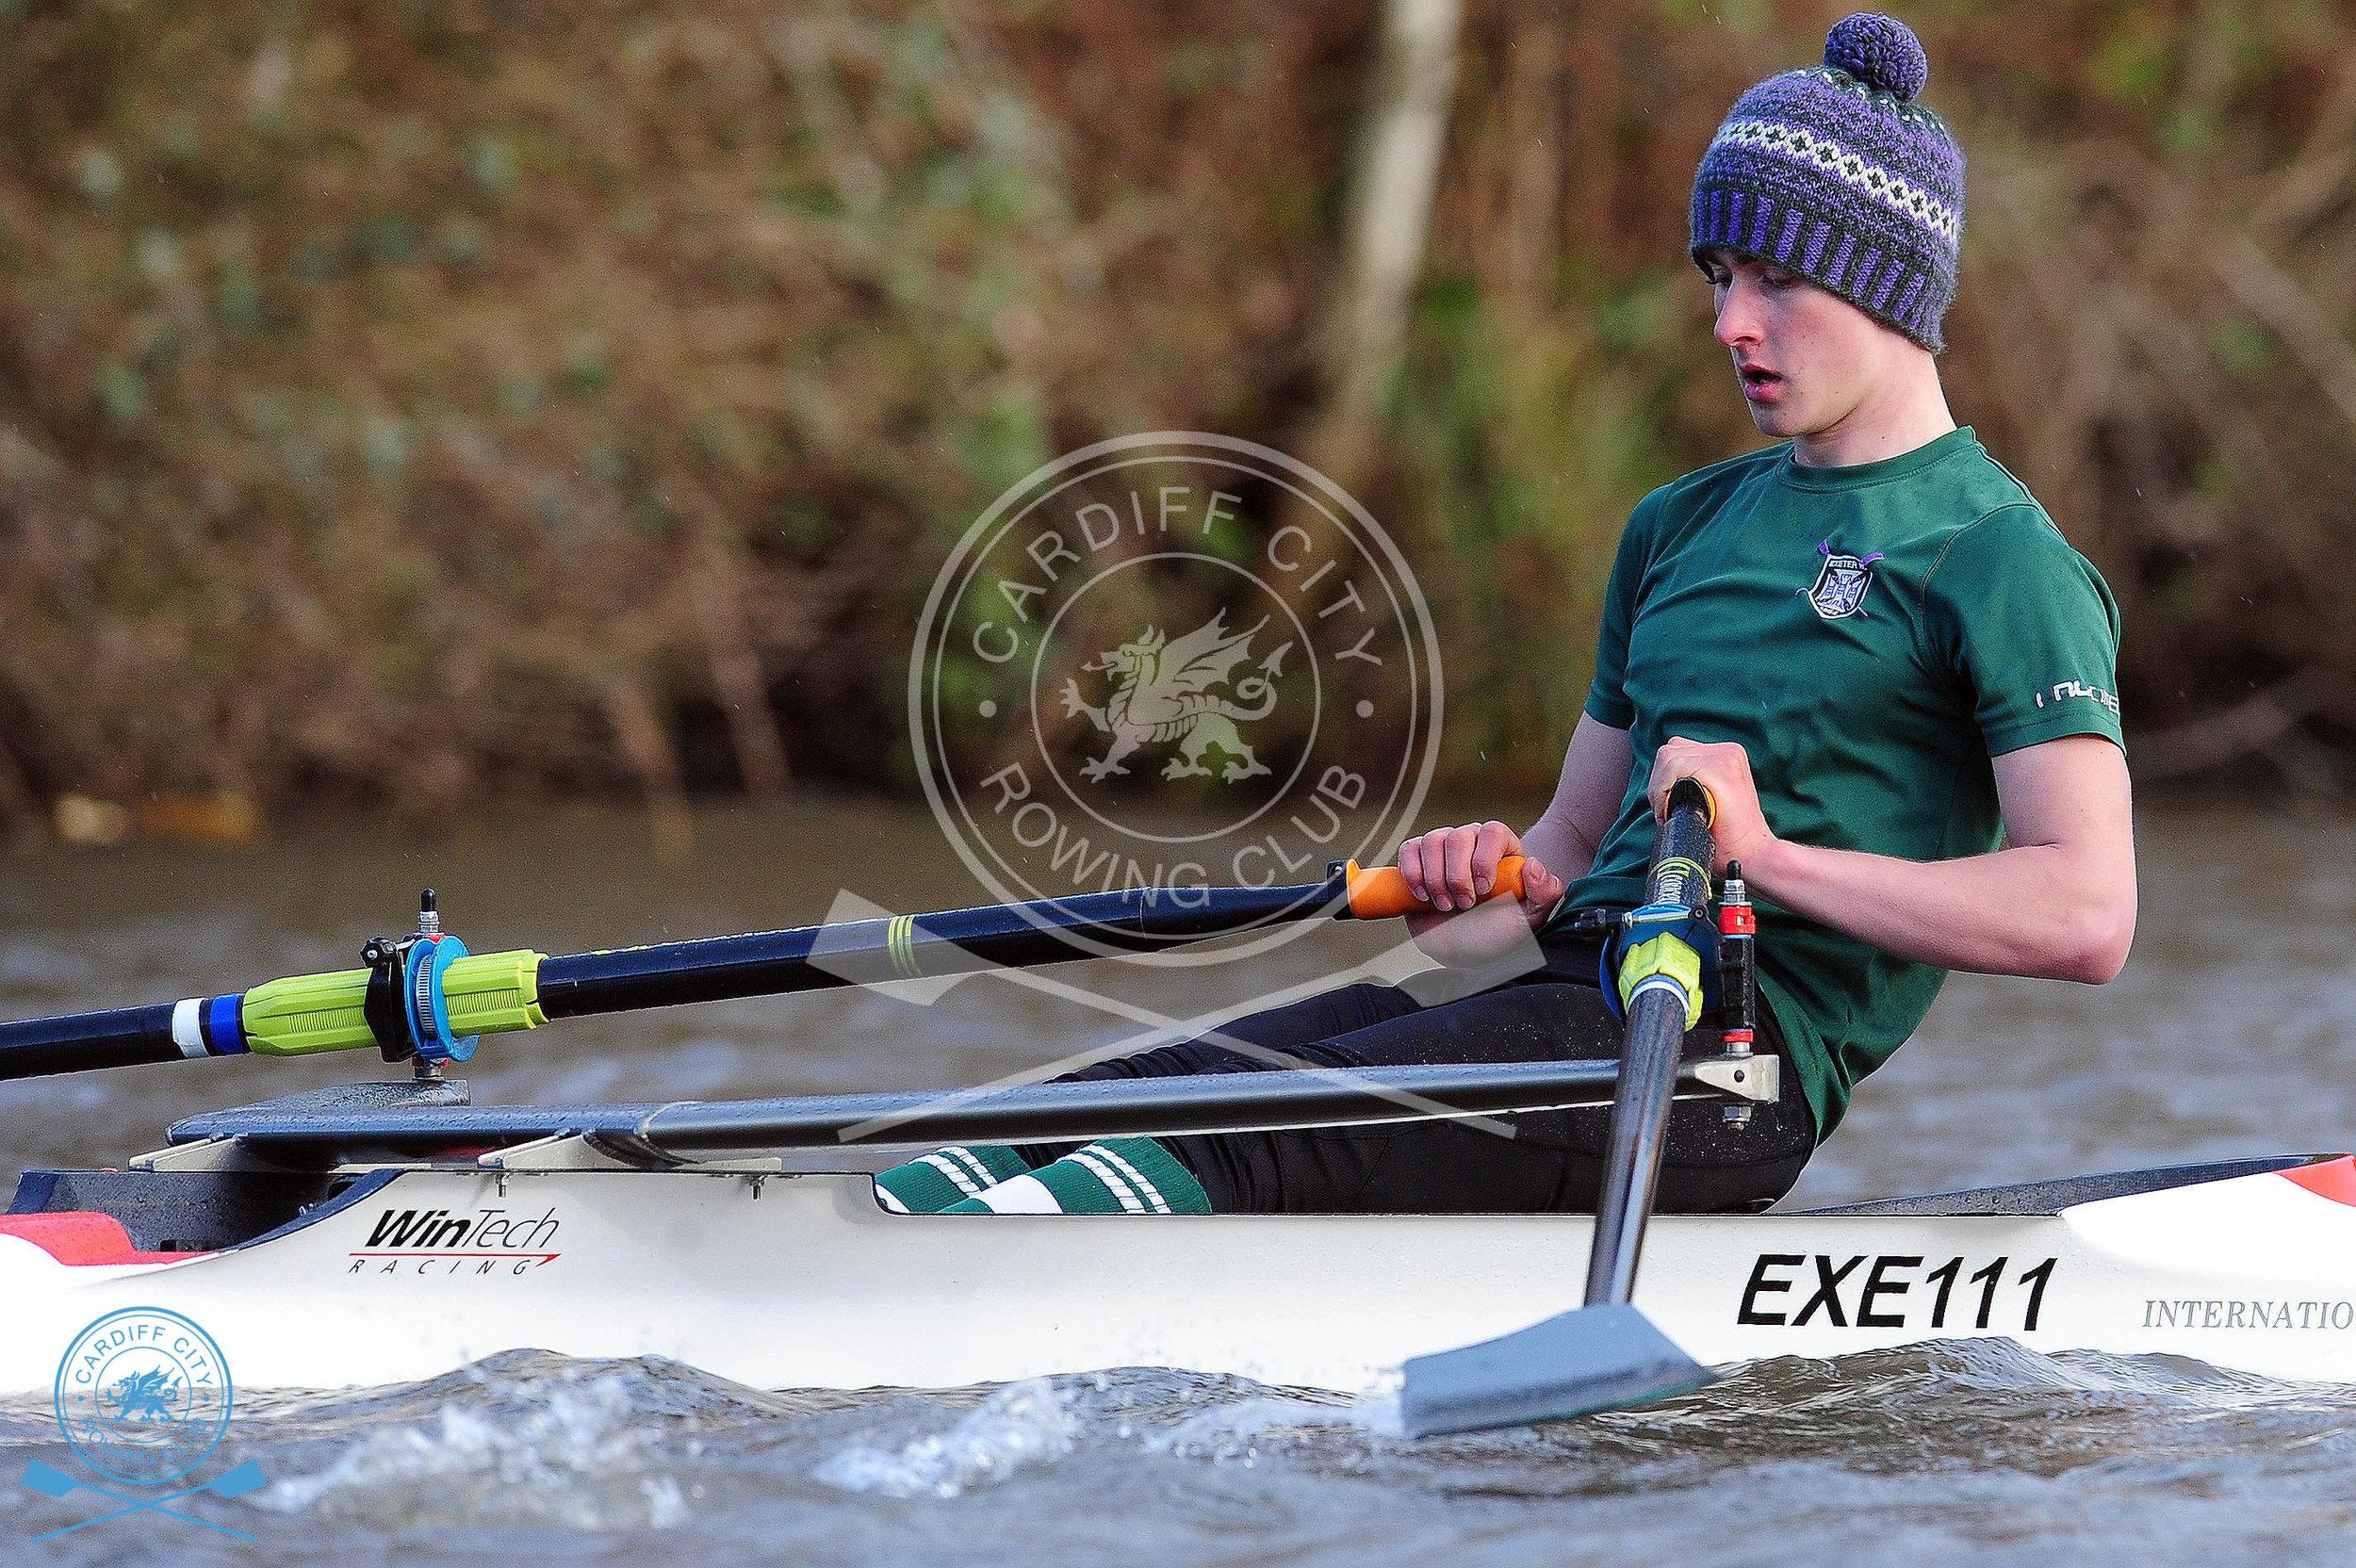 DW_280119_Cardiff_City_Rowing_320.jpg